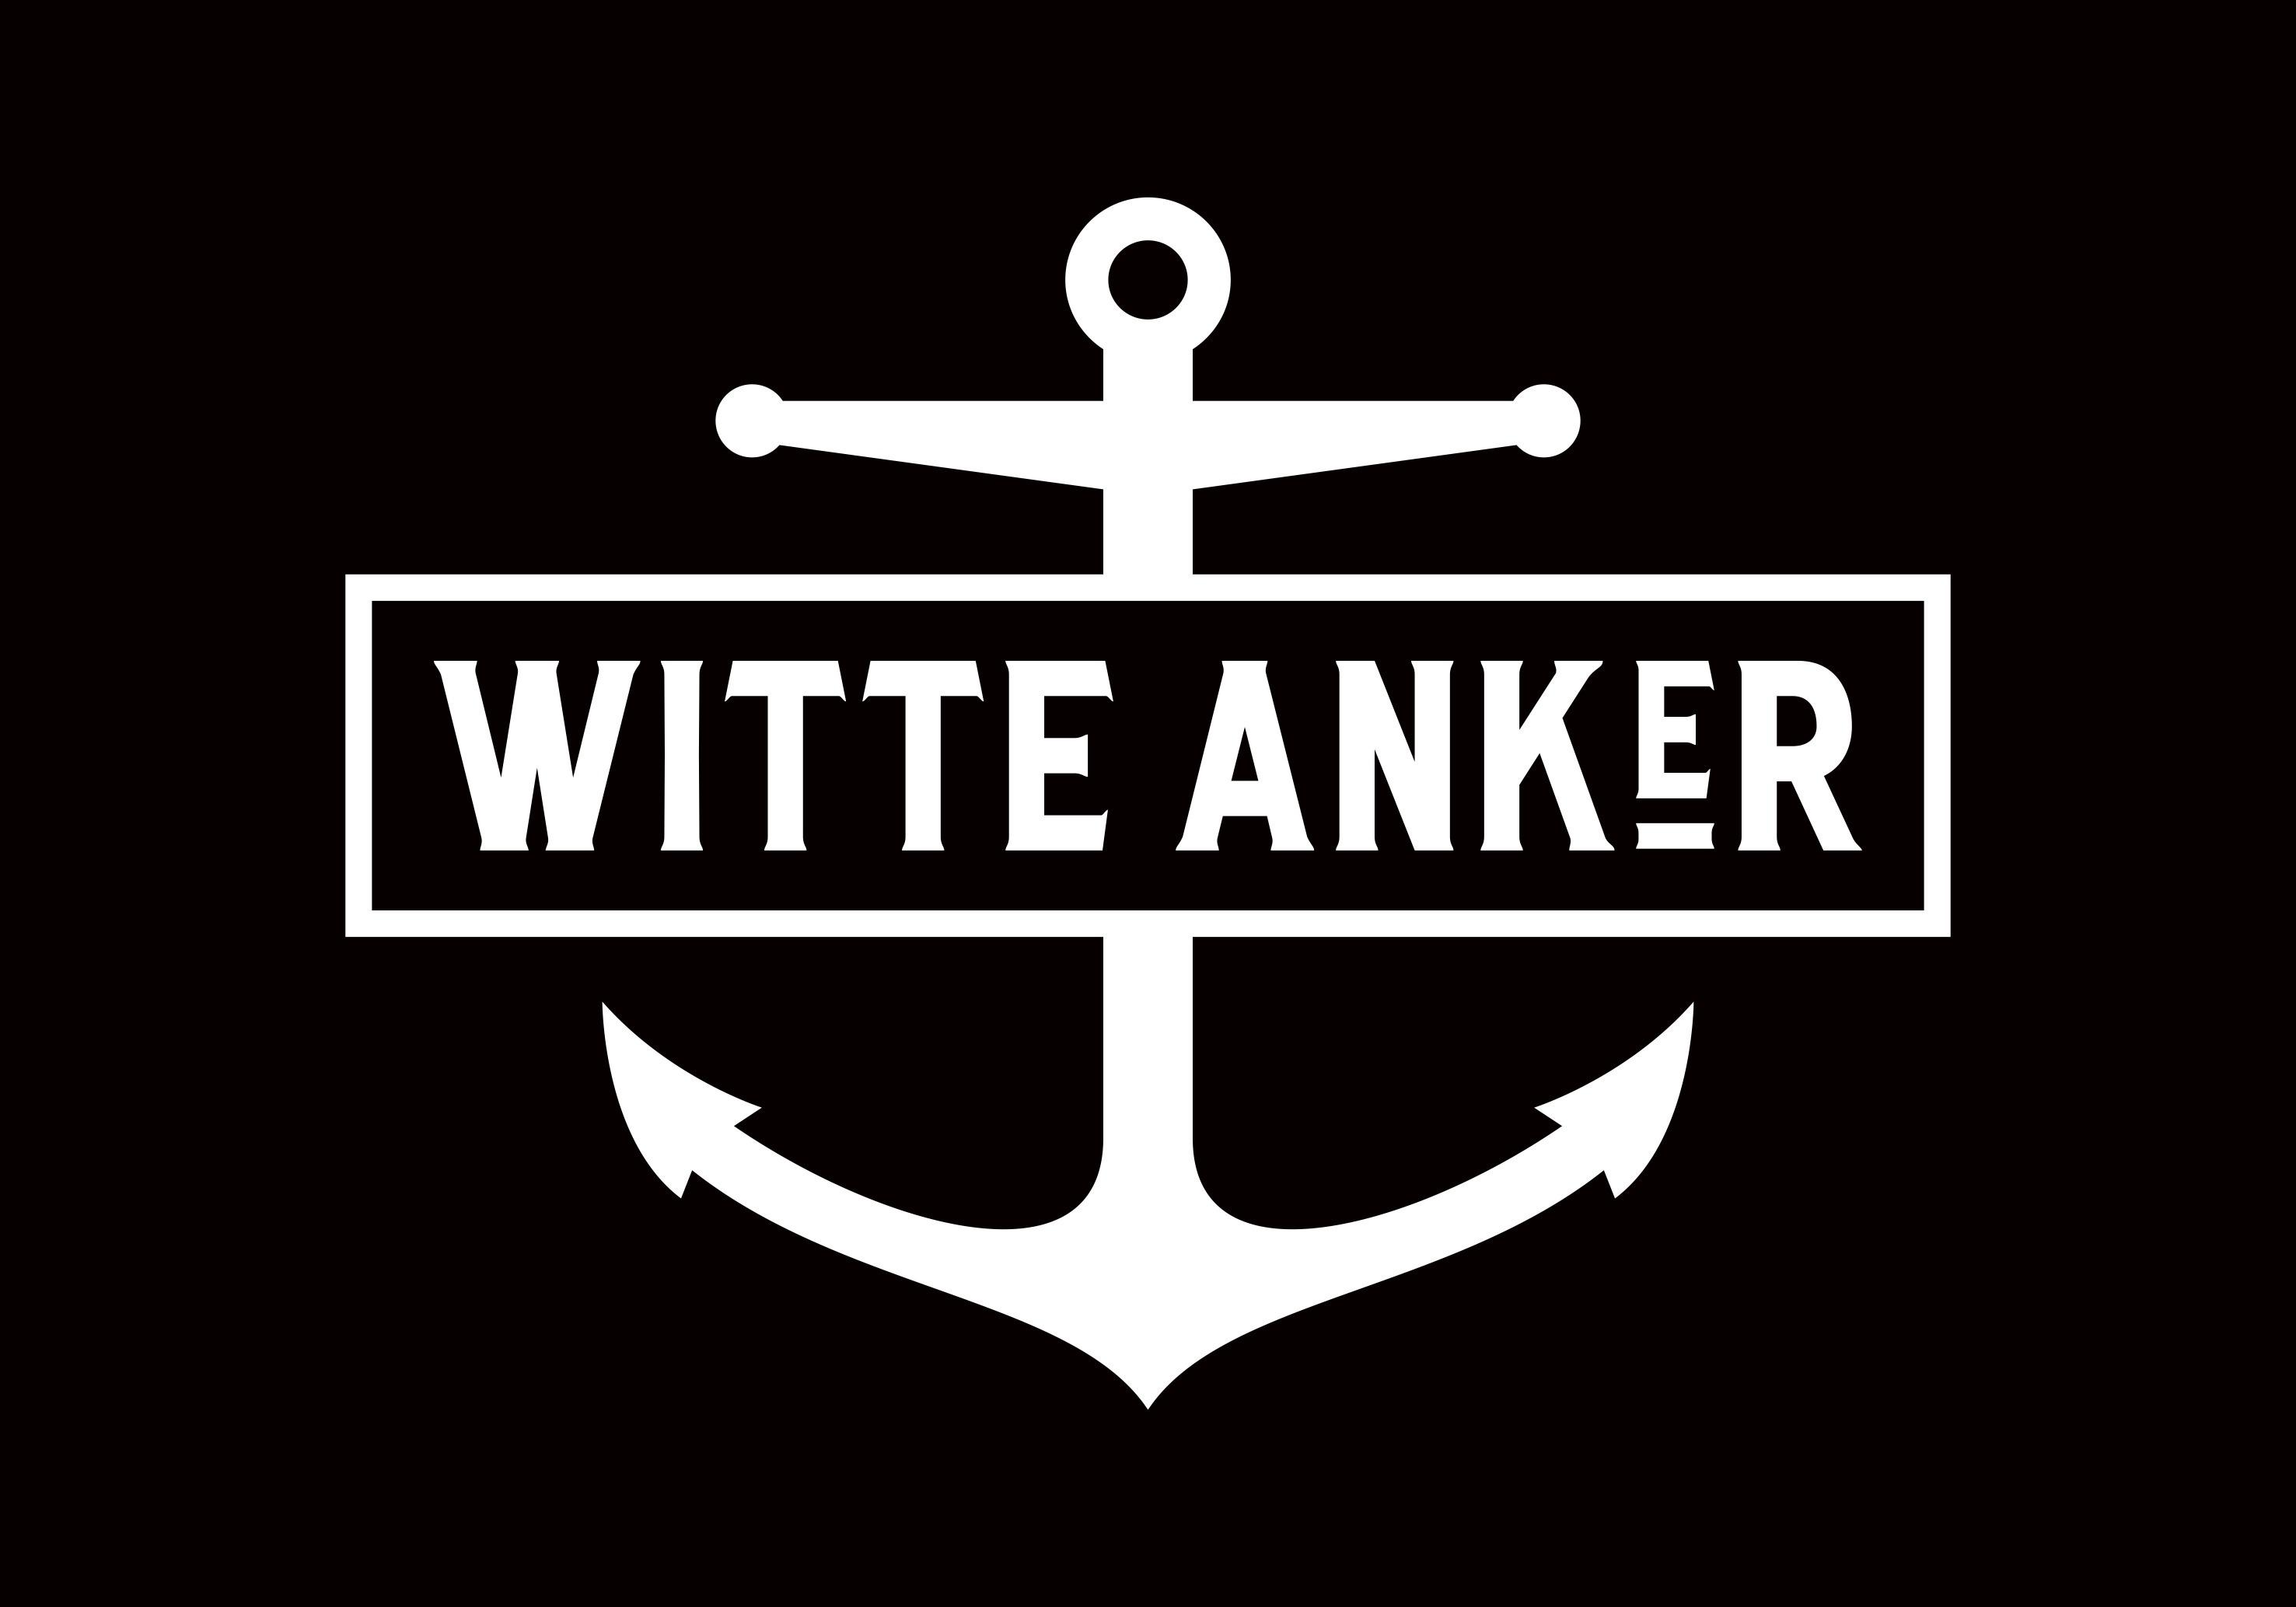 Logo van Witte Anker gevestigd in Breda uit Nederland